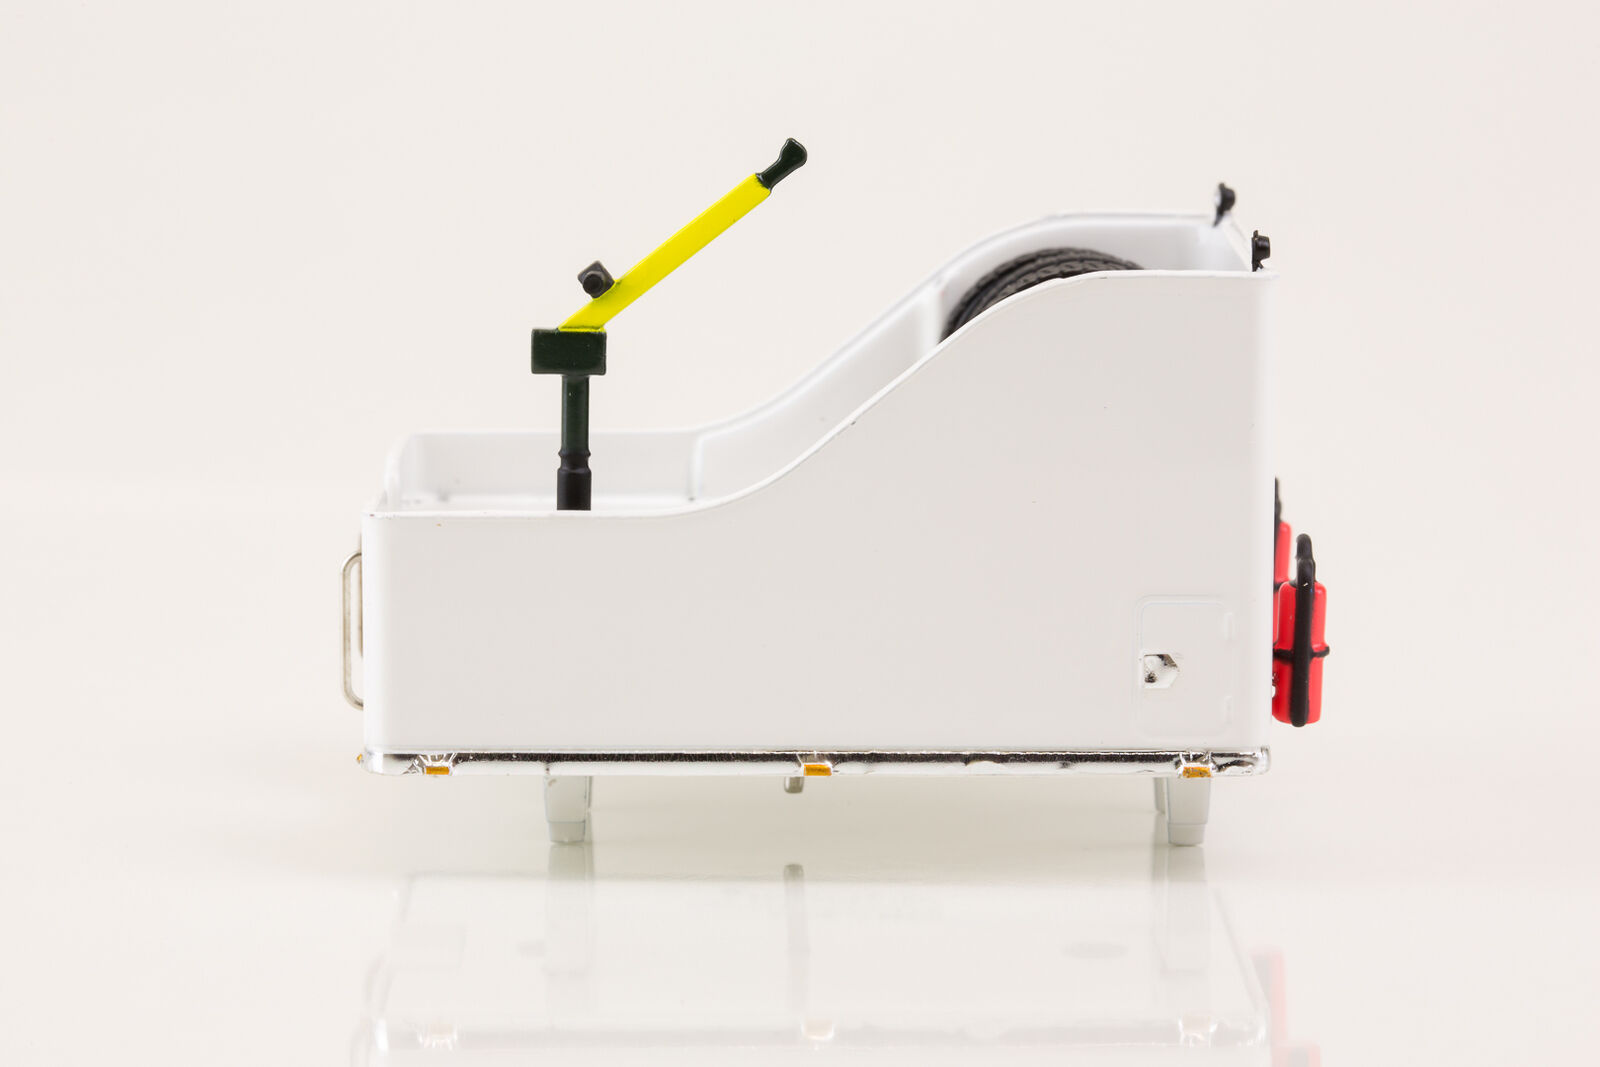 Drake Z0B001 AUSTRALIAN BALLAST BOX ICE Weiß DIECAST - Scale 1 50